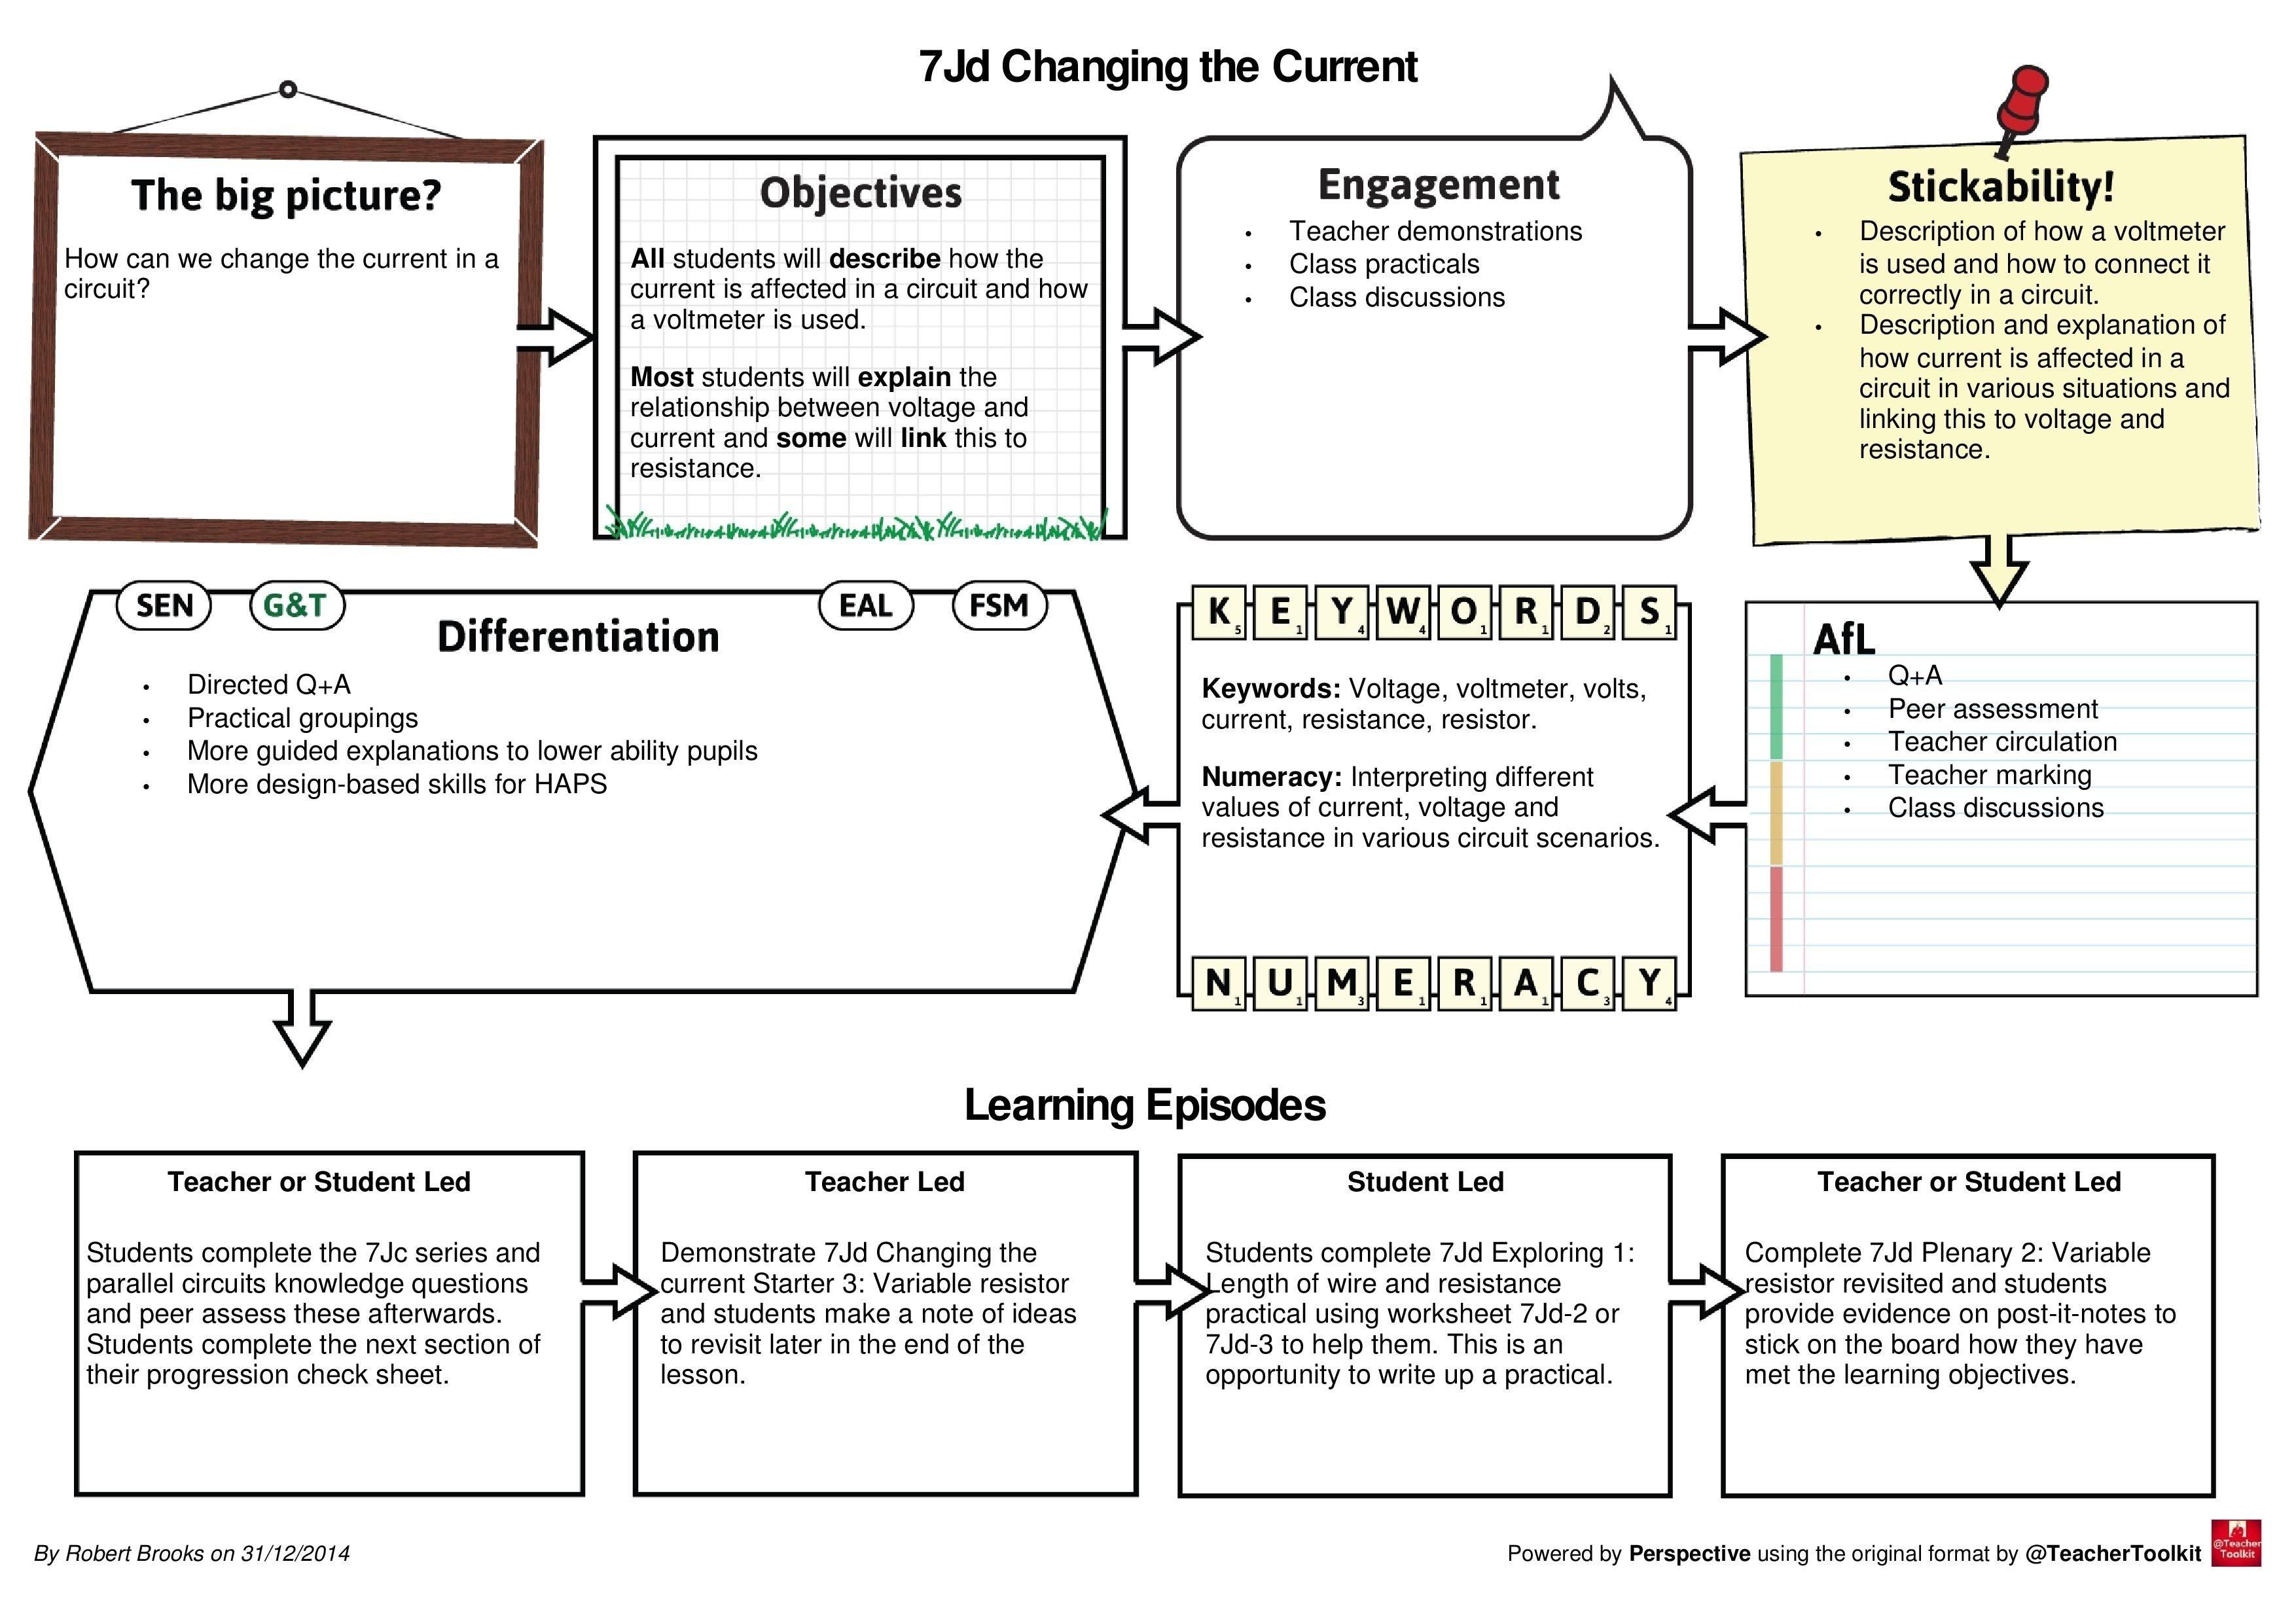 10 Unique 5 Minute Lesson Plan Ideas ks3 new exploring science example lesson plans robert brooks 2020